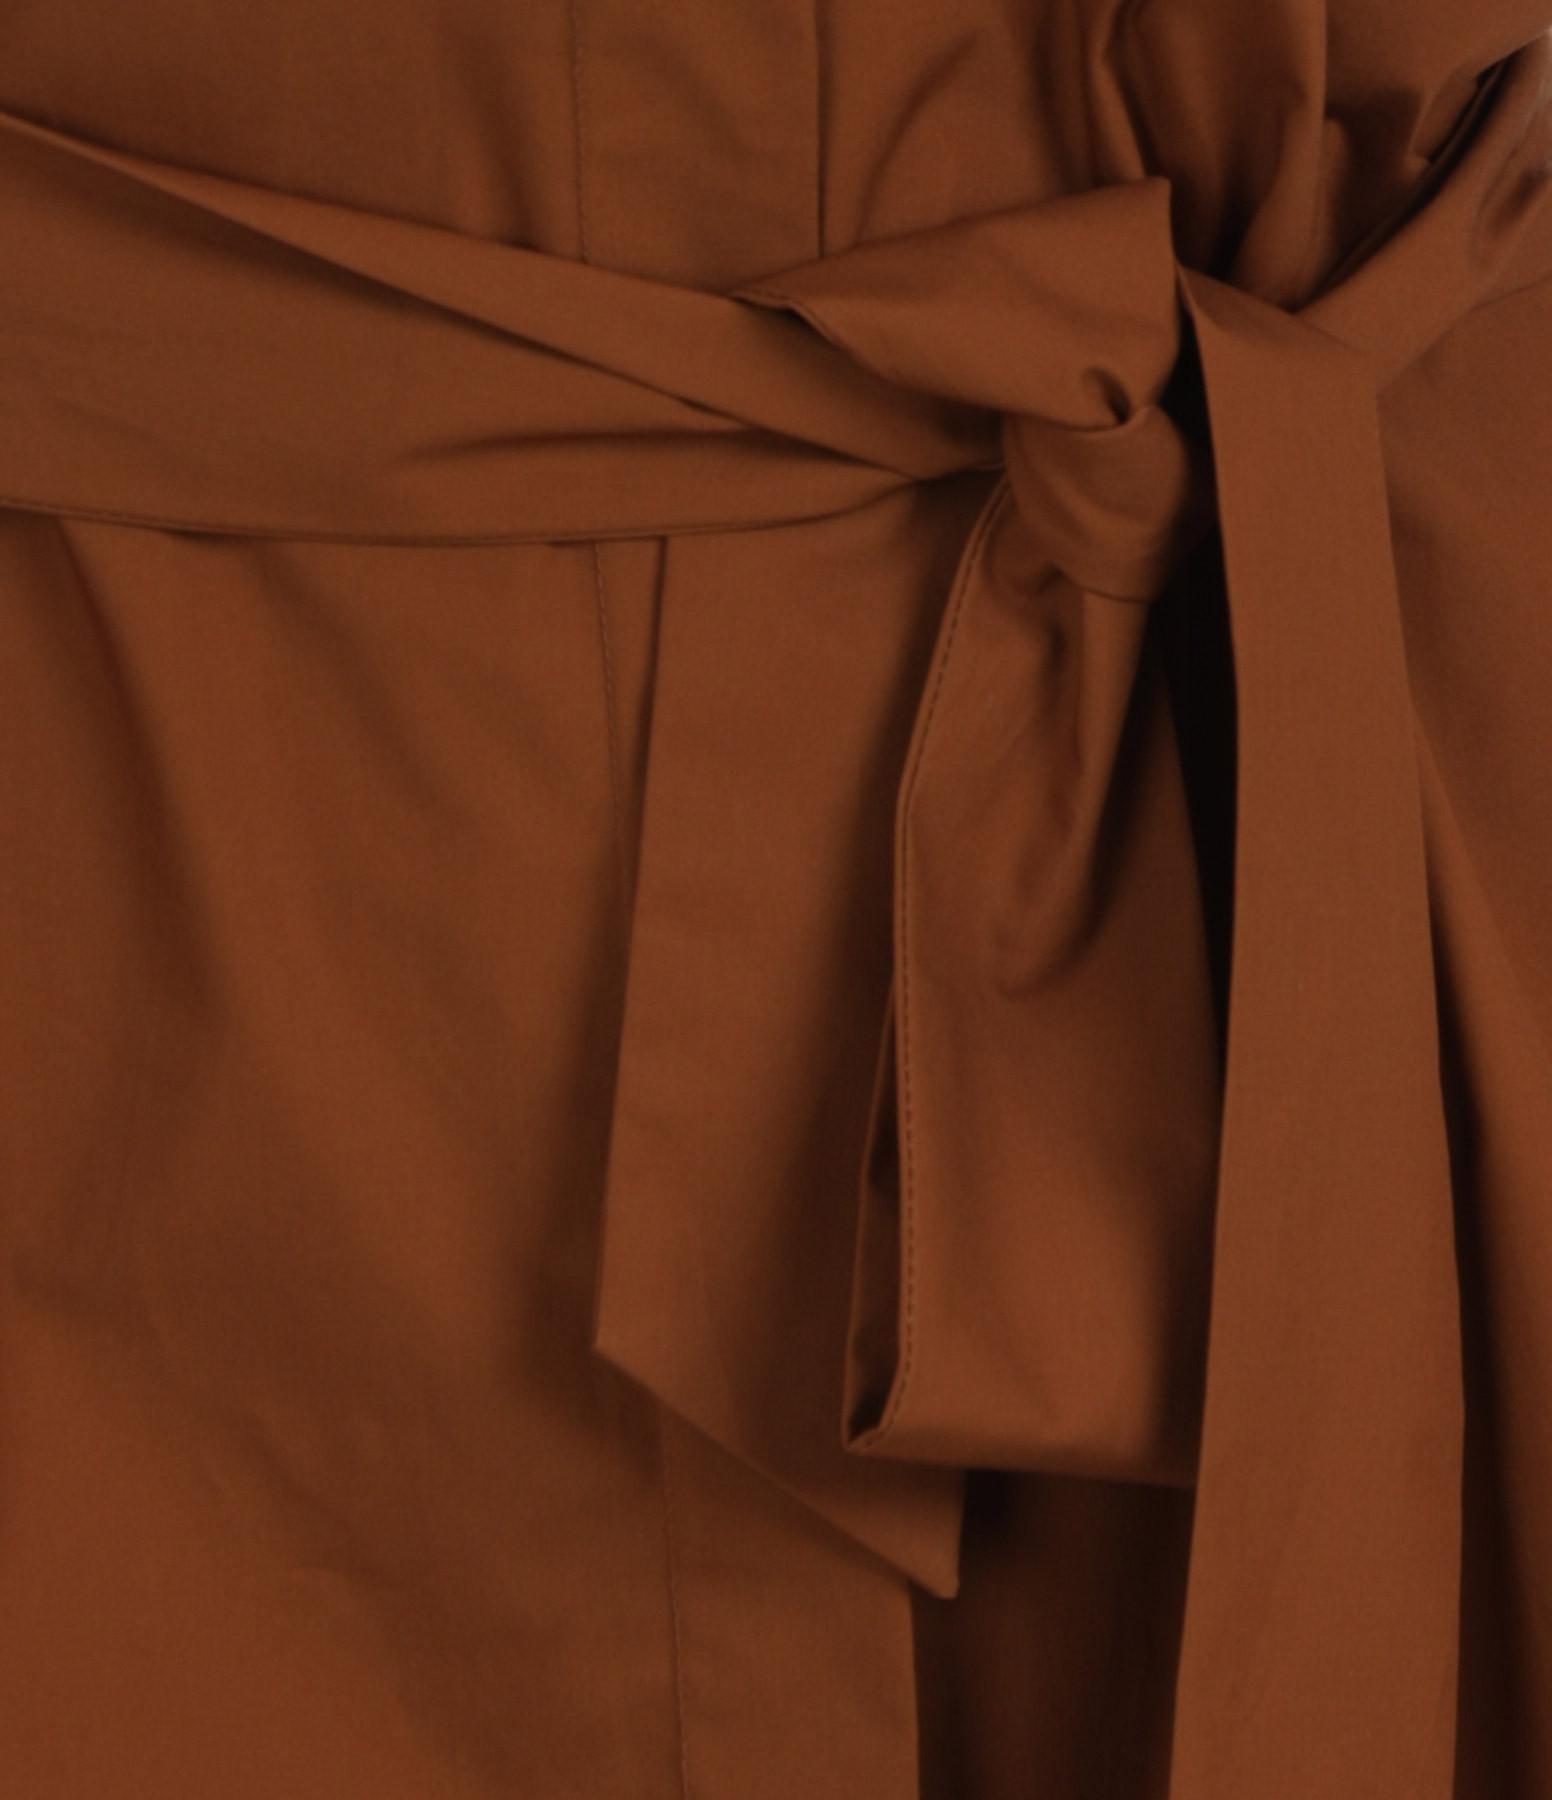 SEASONS - Robe Chemise Coton Mordoré